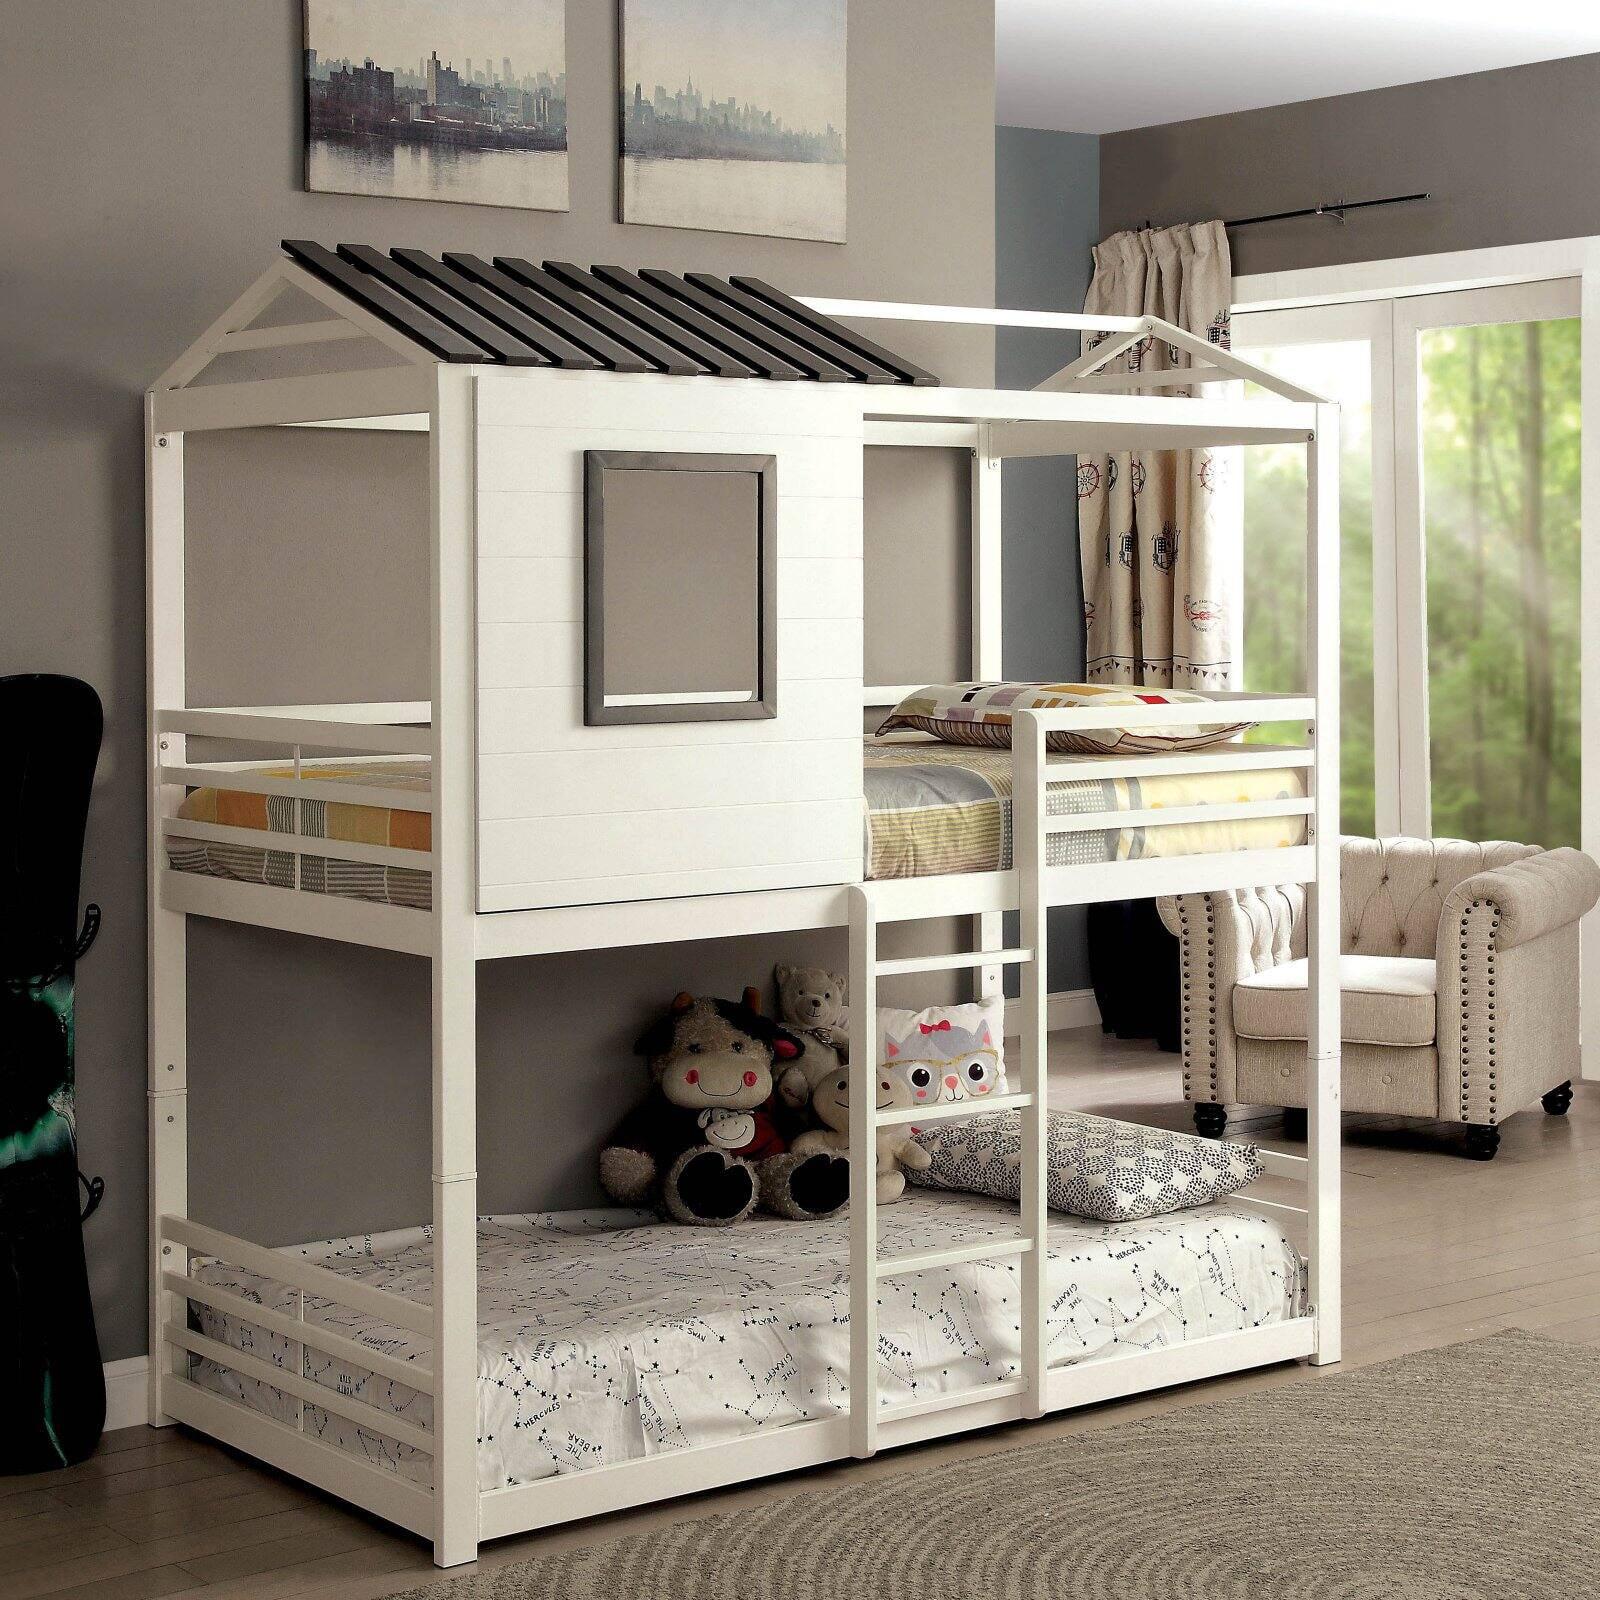 Furniture Of America Hansel Wood Veneer Bunk Bed Low Profile Twin Over Twin White Walmart Com Walmart Com